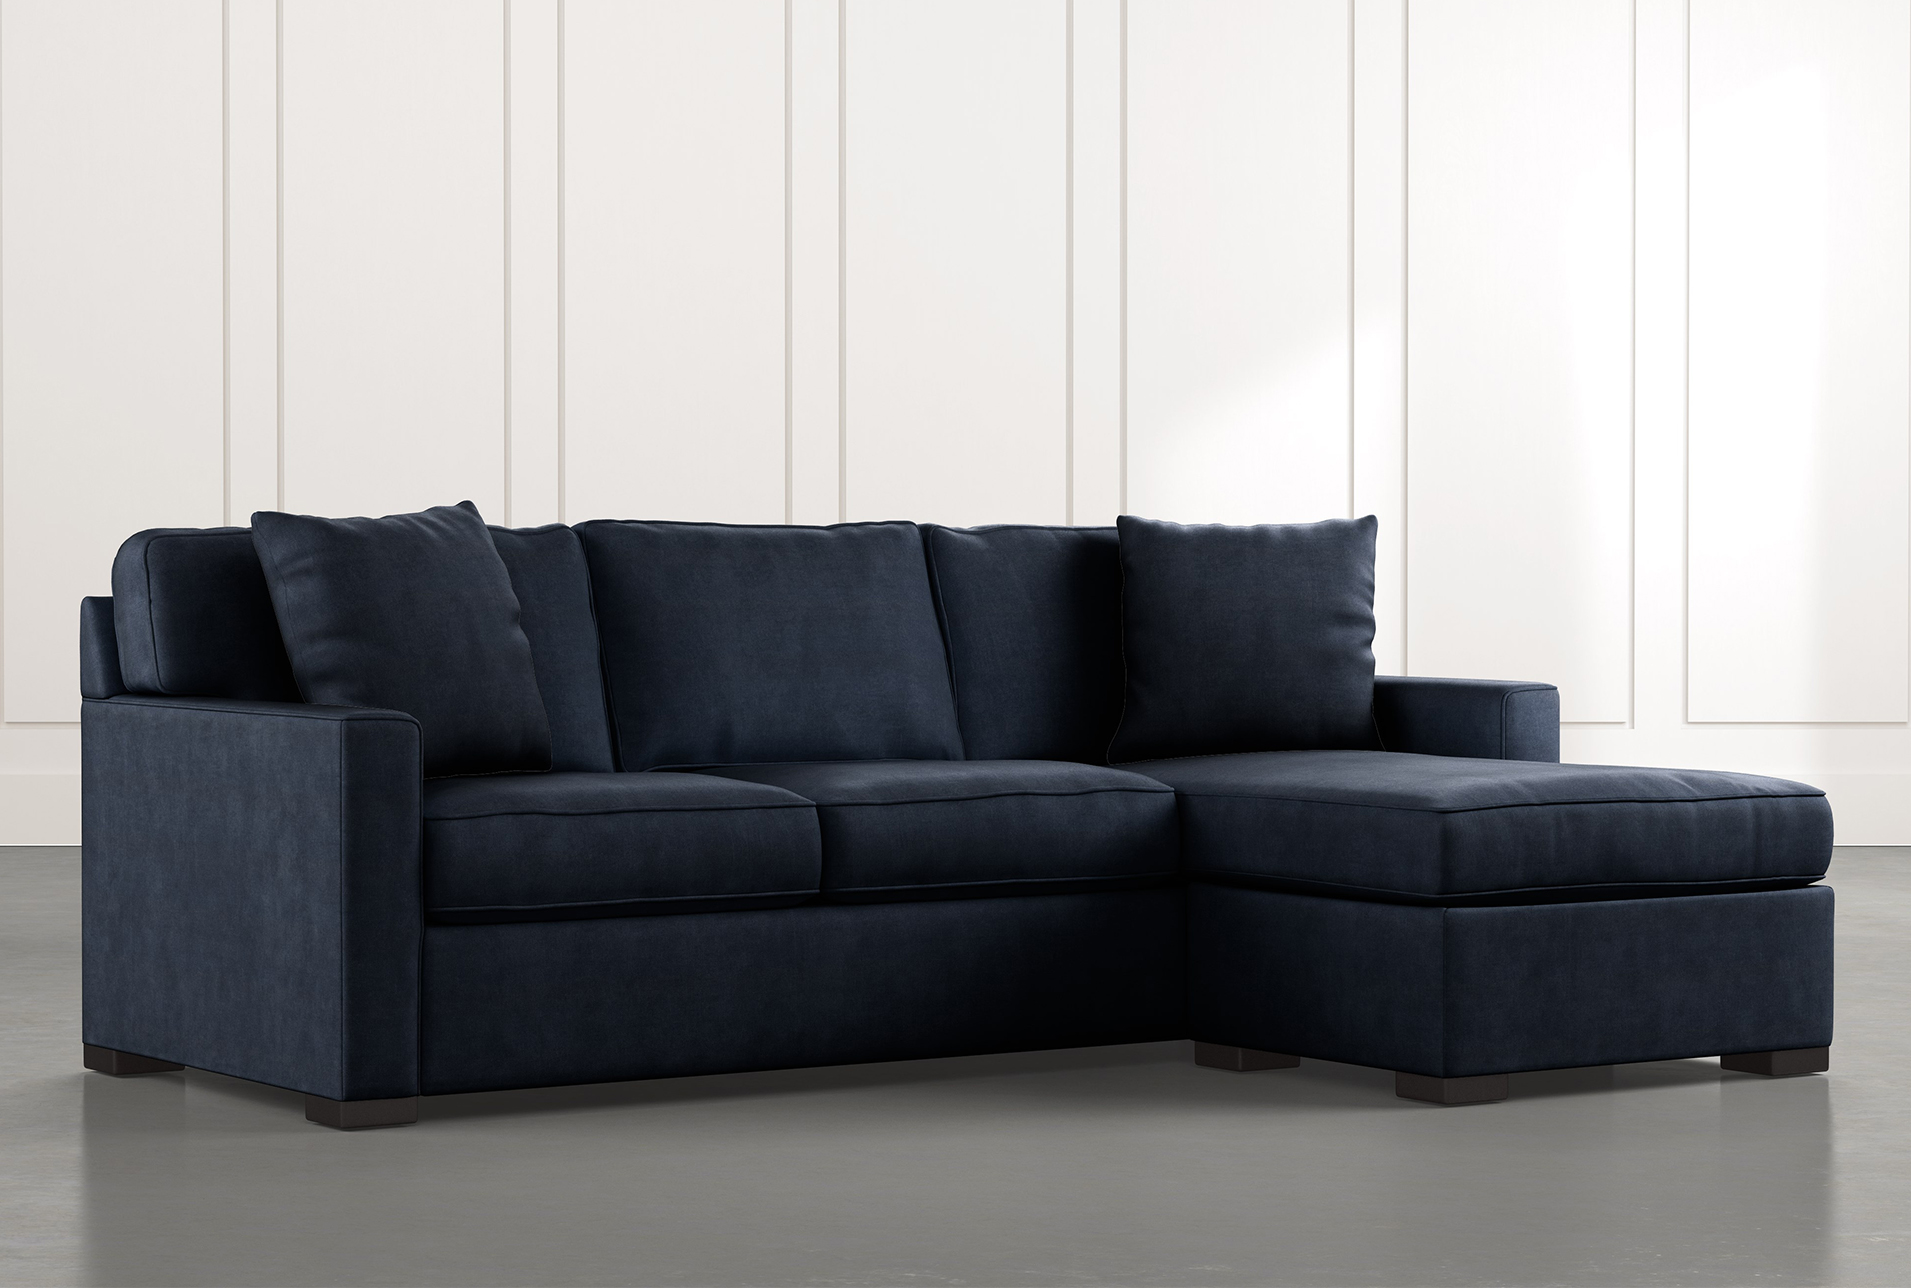 Taren Ii Navy Blue Reversible Sofa Chaise Sleeper W Storage Ottoman Chaise Sofa Storage Ottoman Sectional Sofa